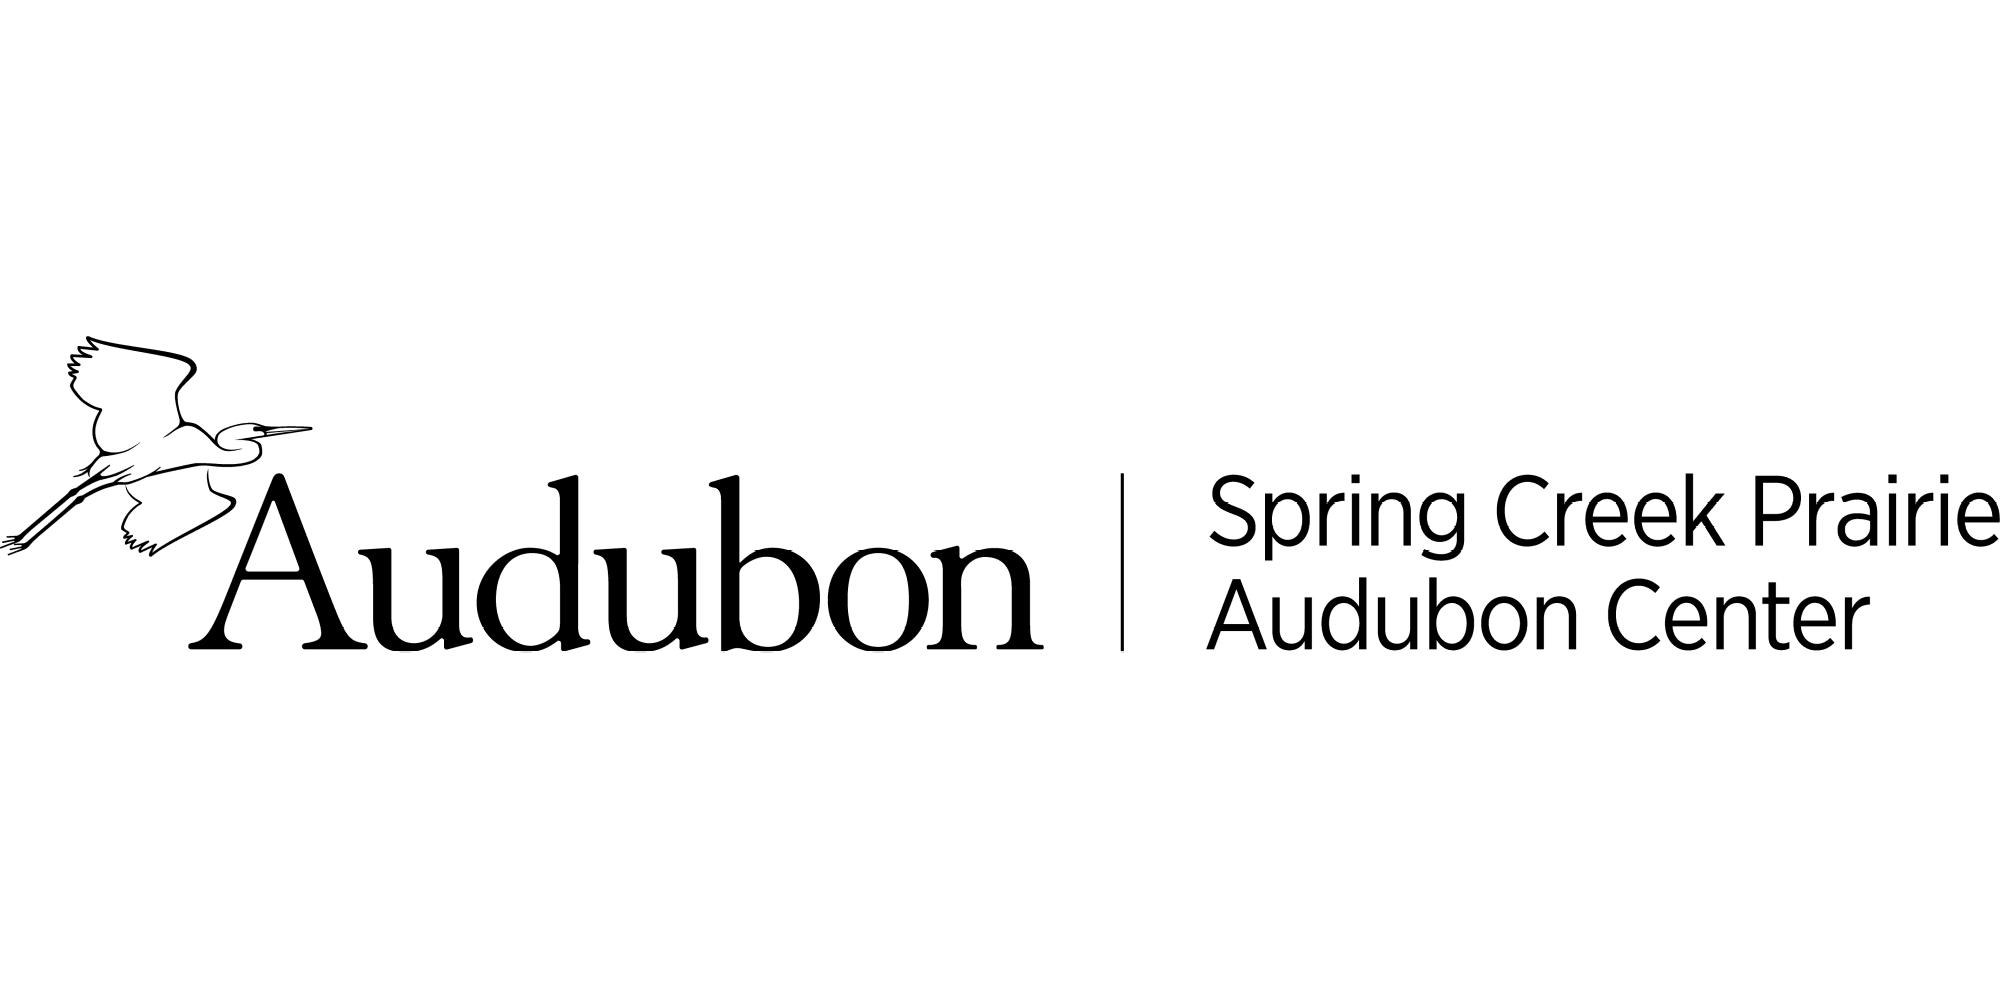 Spring Creek Prairie Audubon Center